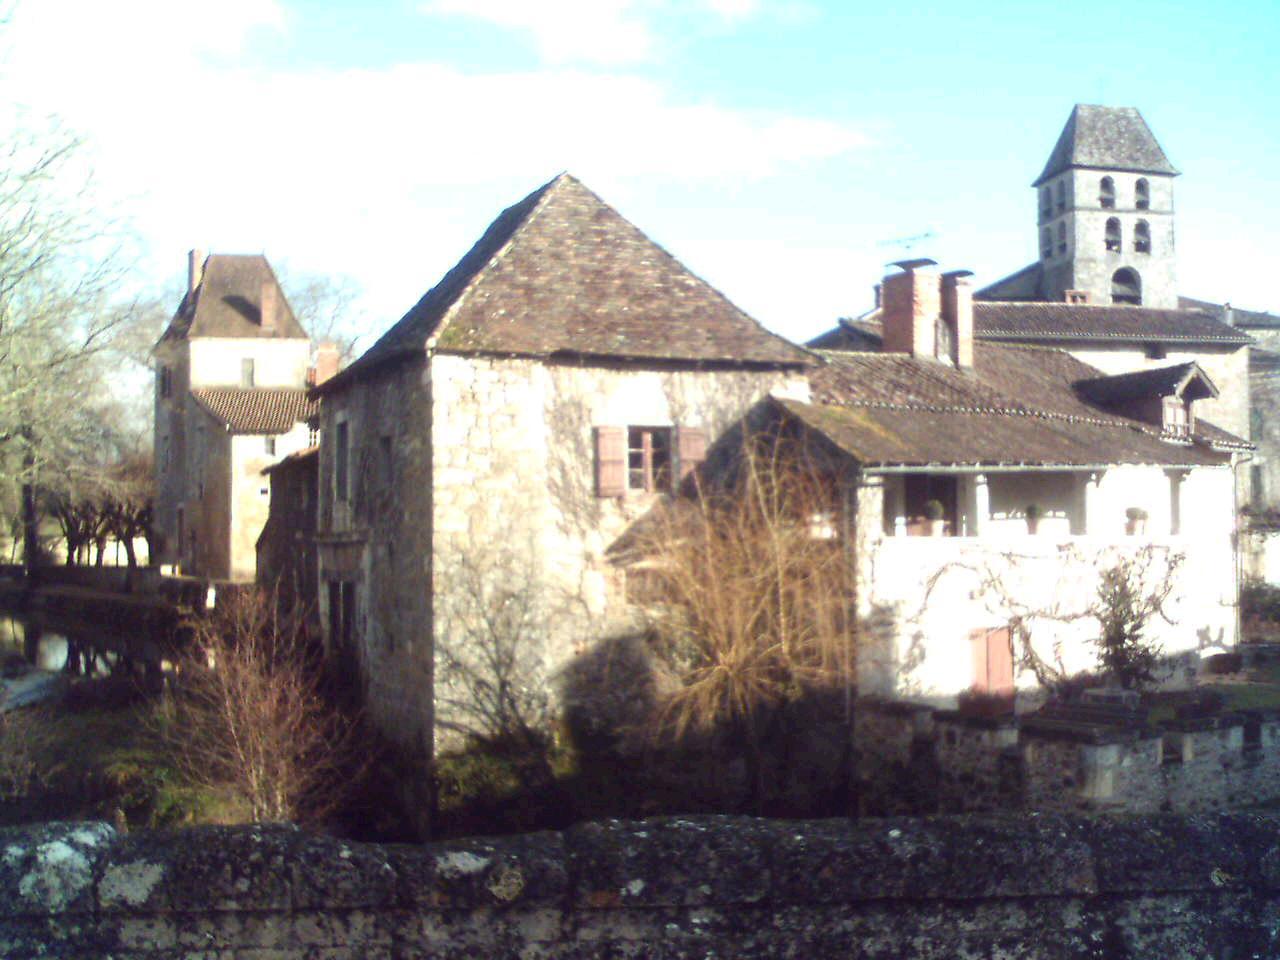 St-Jean-de-Cole